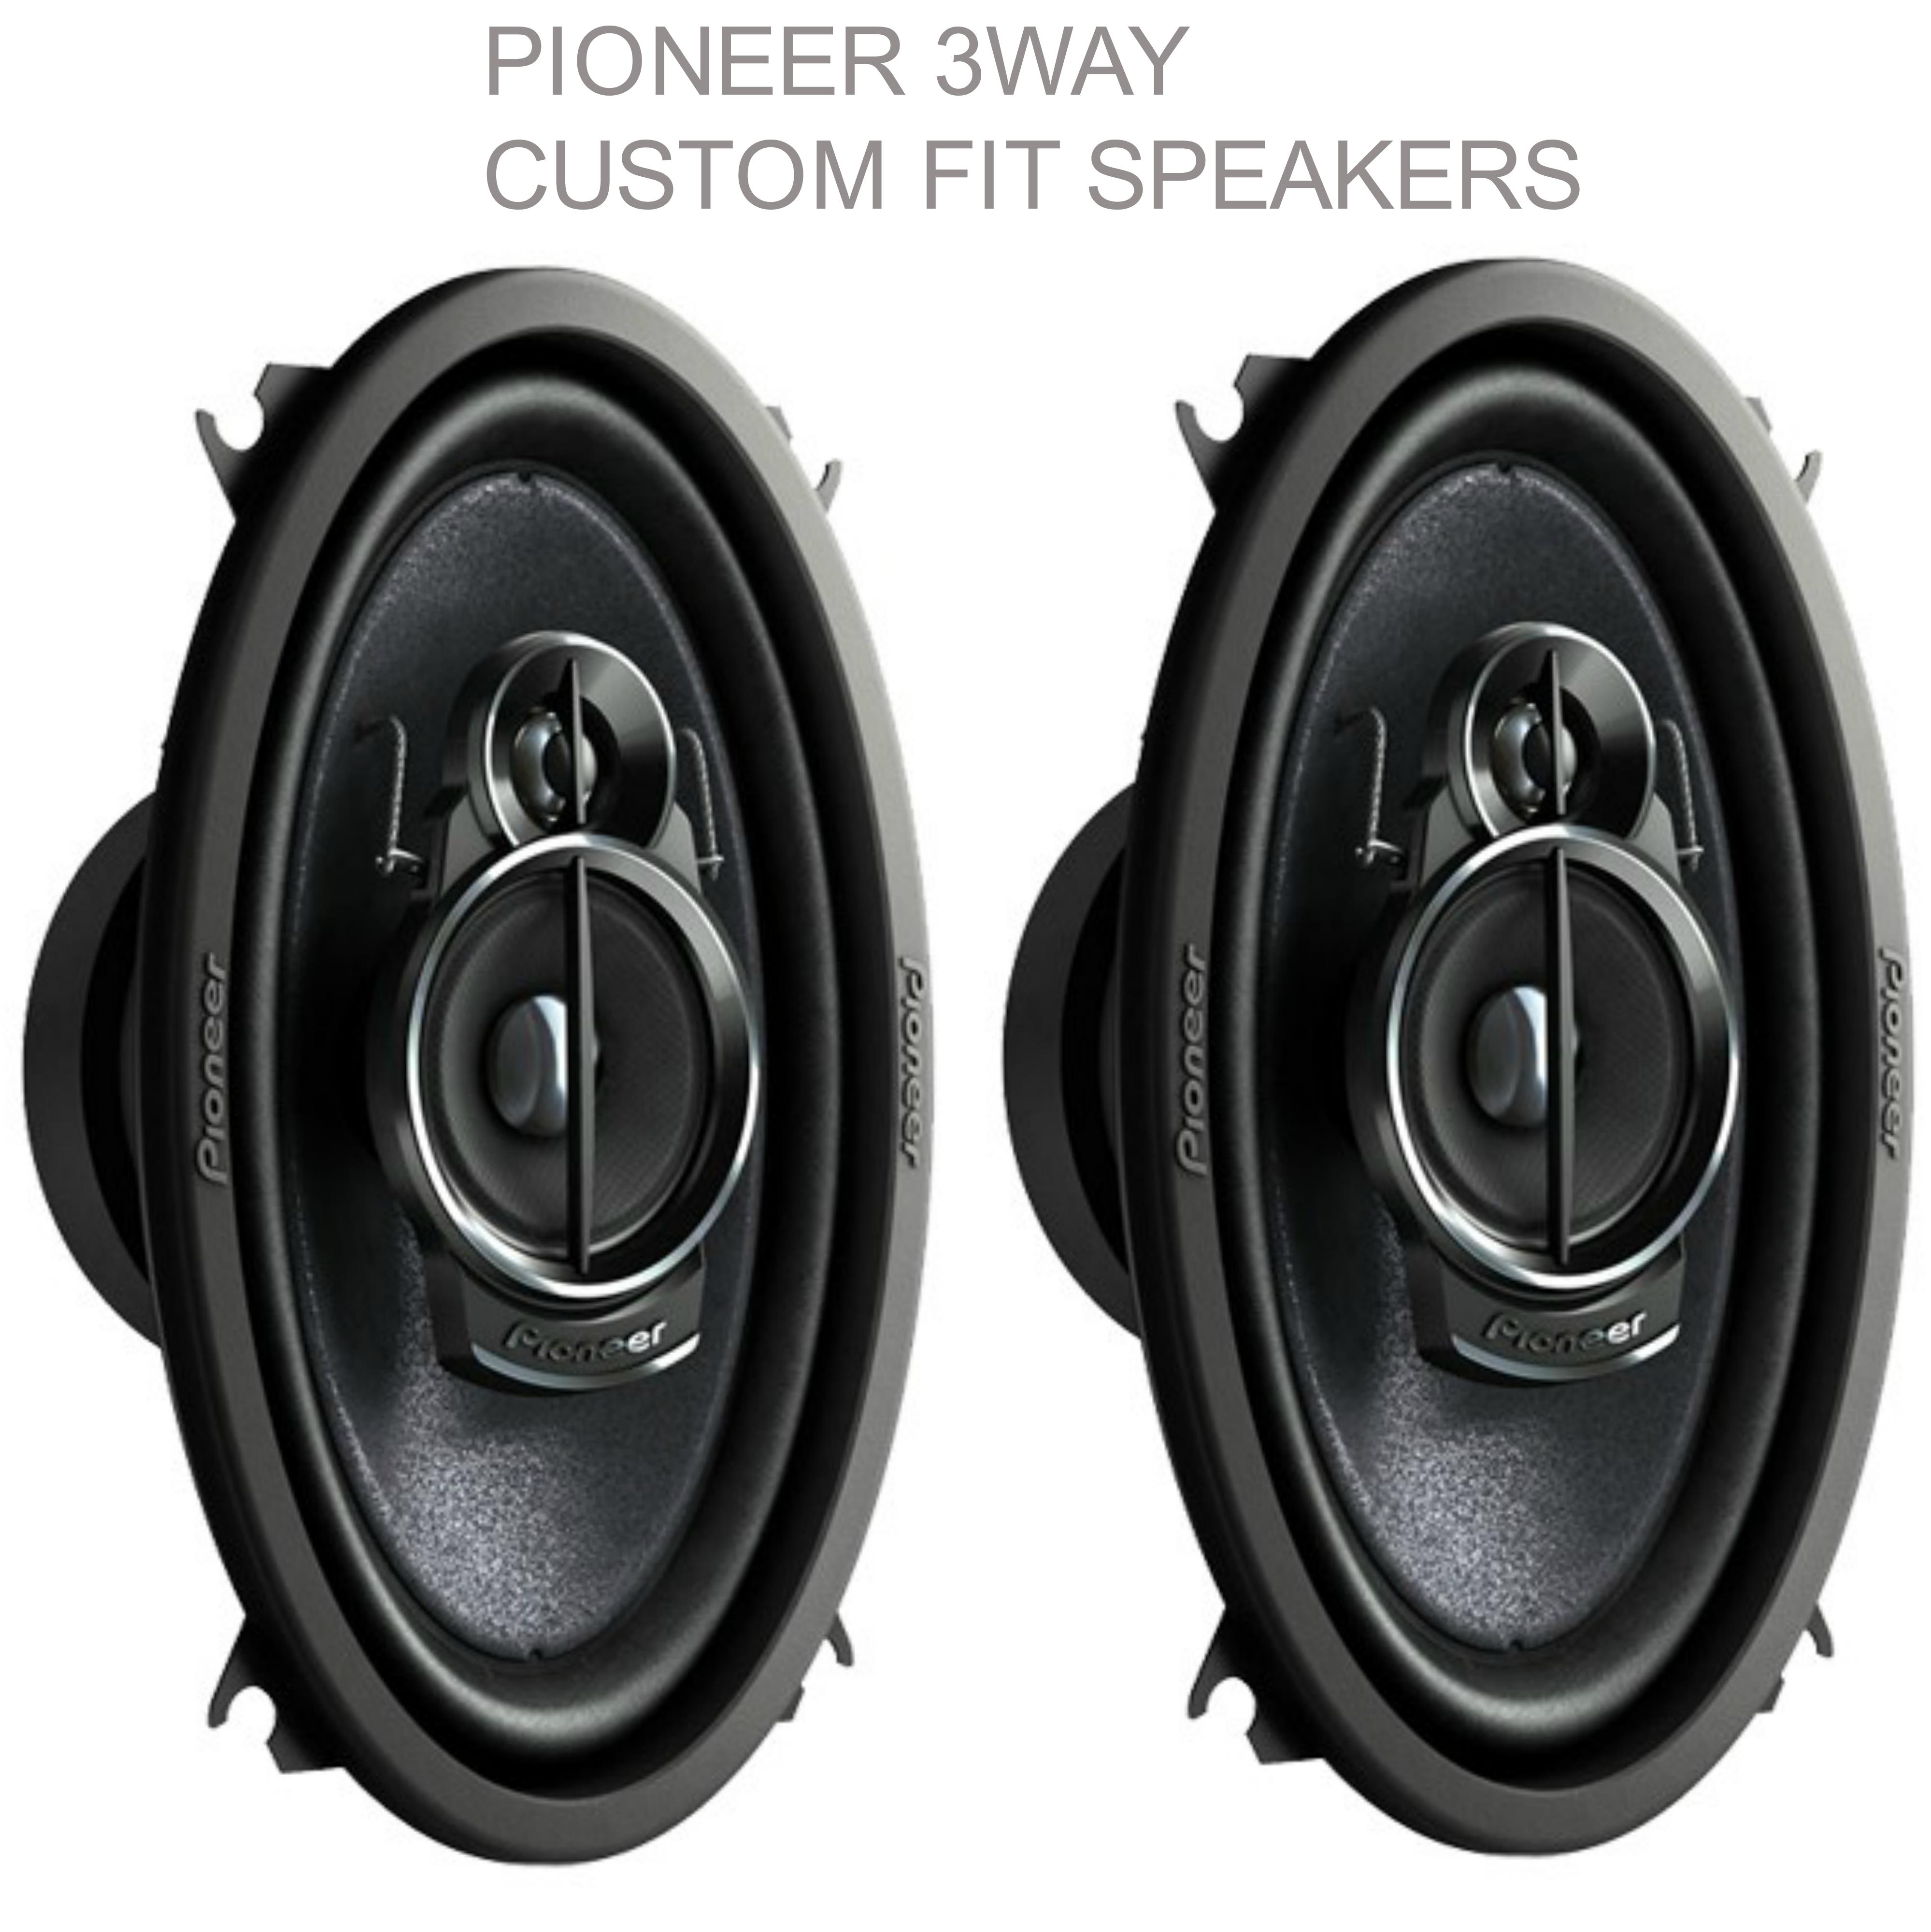 "NEW Pioneer TS A4633i ?3 Way Custom Fit Car Speakers?200w Max?6""x4""?1YR WARRANTY"